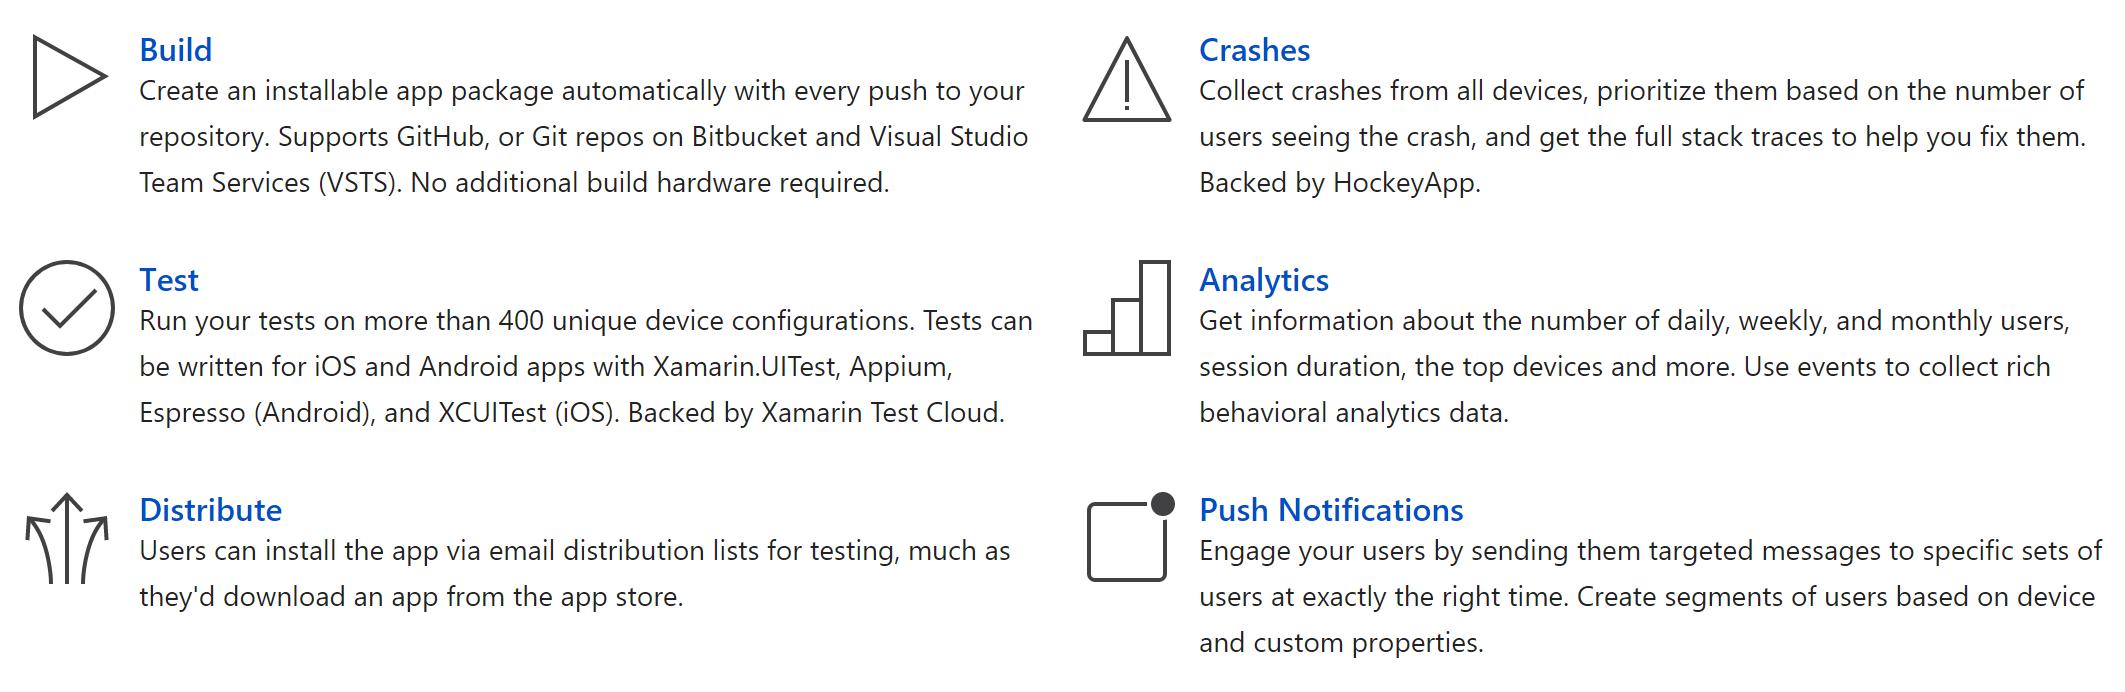 visual studio app center visual